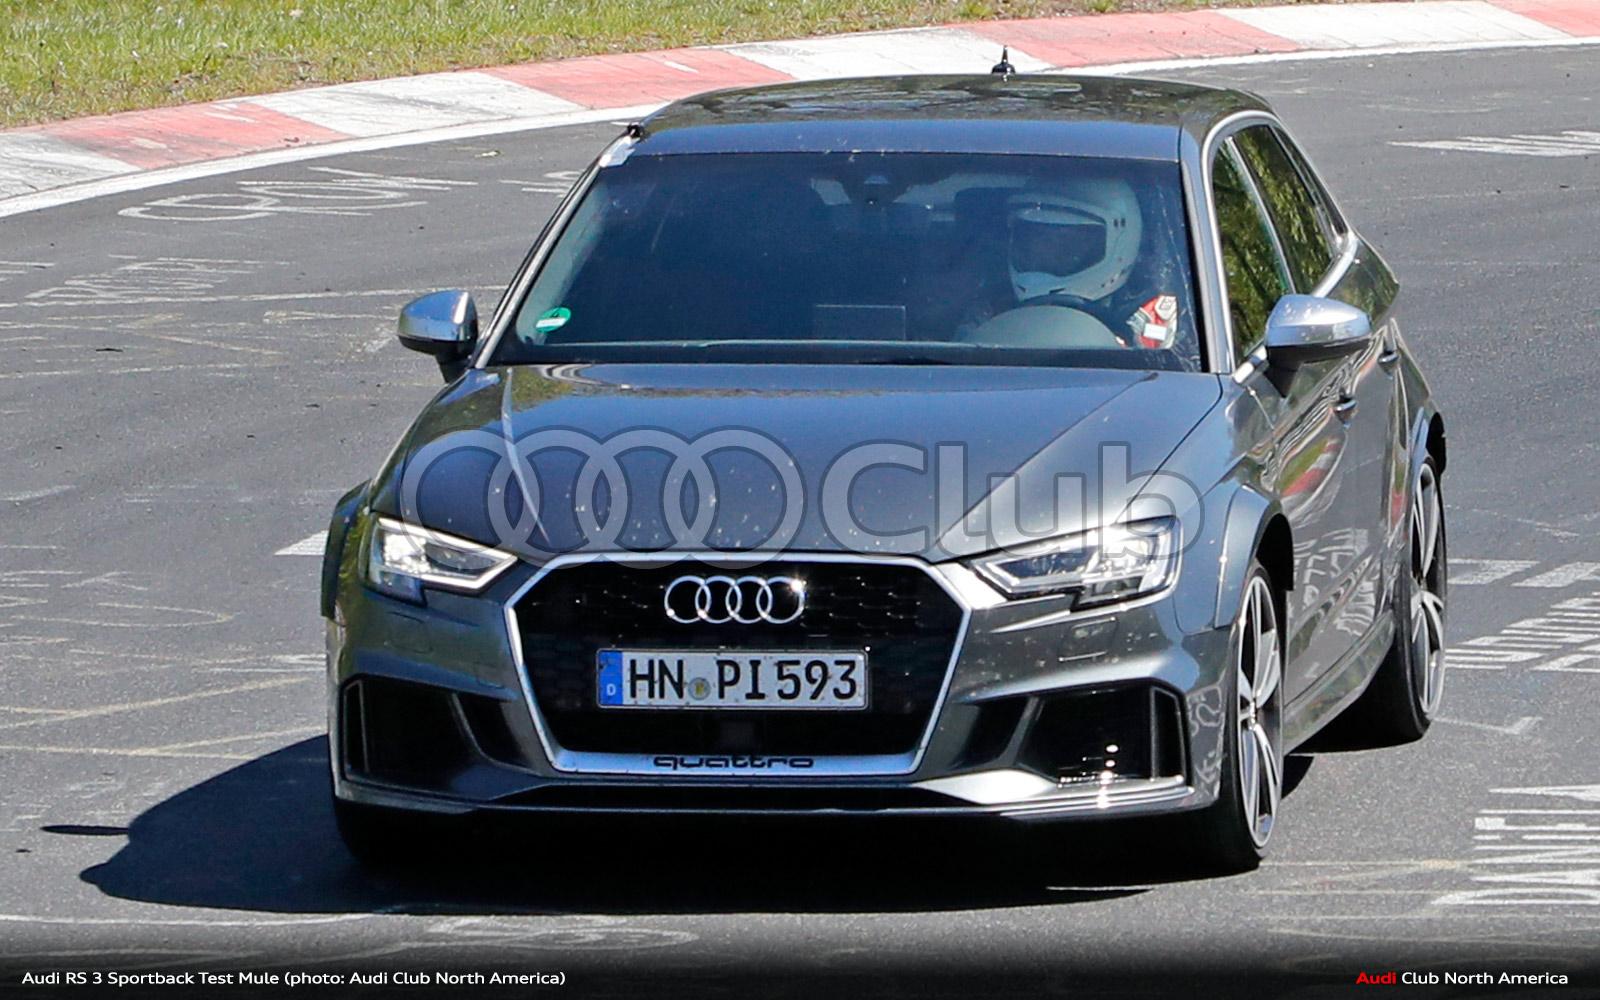 Audi RS 3 Sportback Test Mule Spied